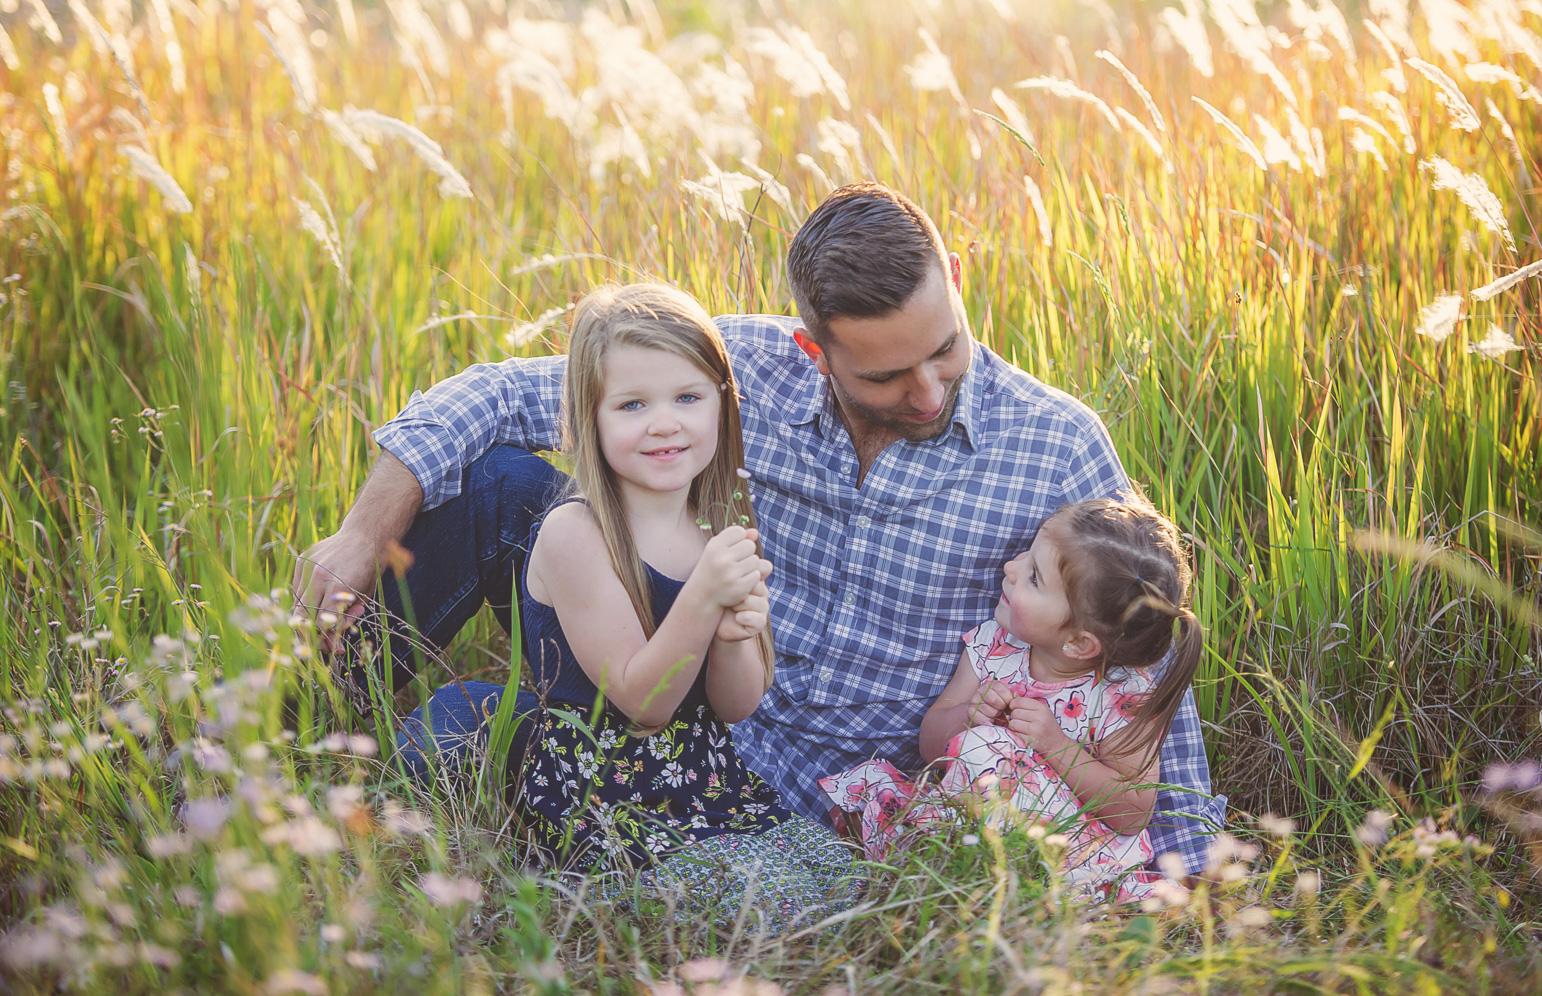 adam-szarmack-family-portraits-photography-love-16.jpg